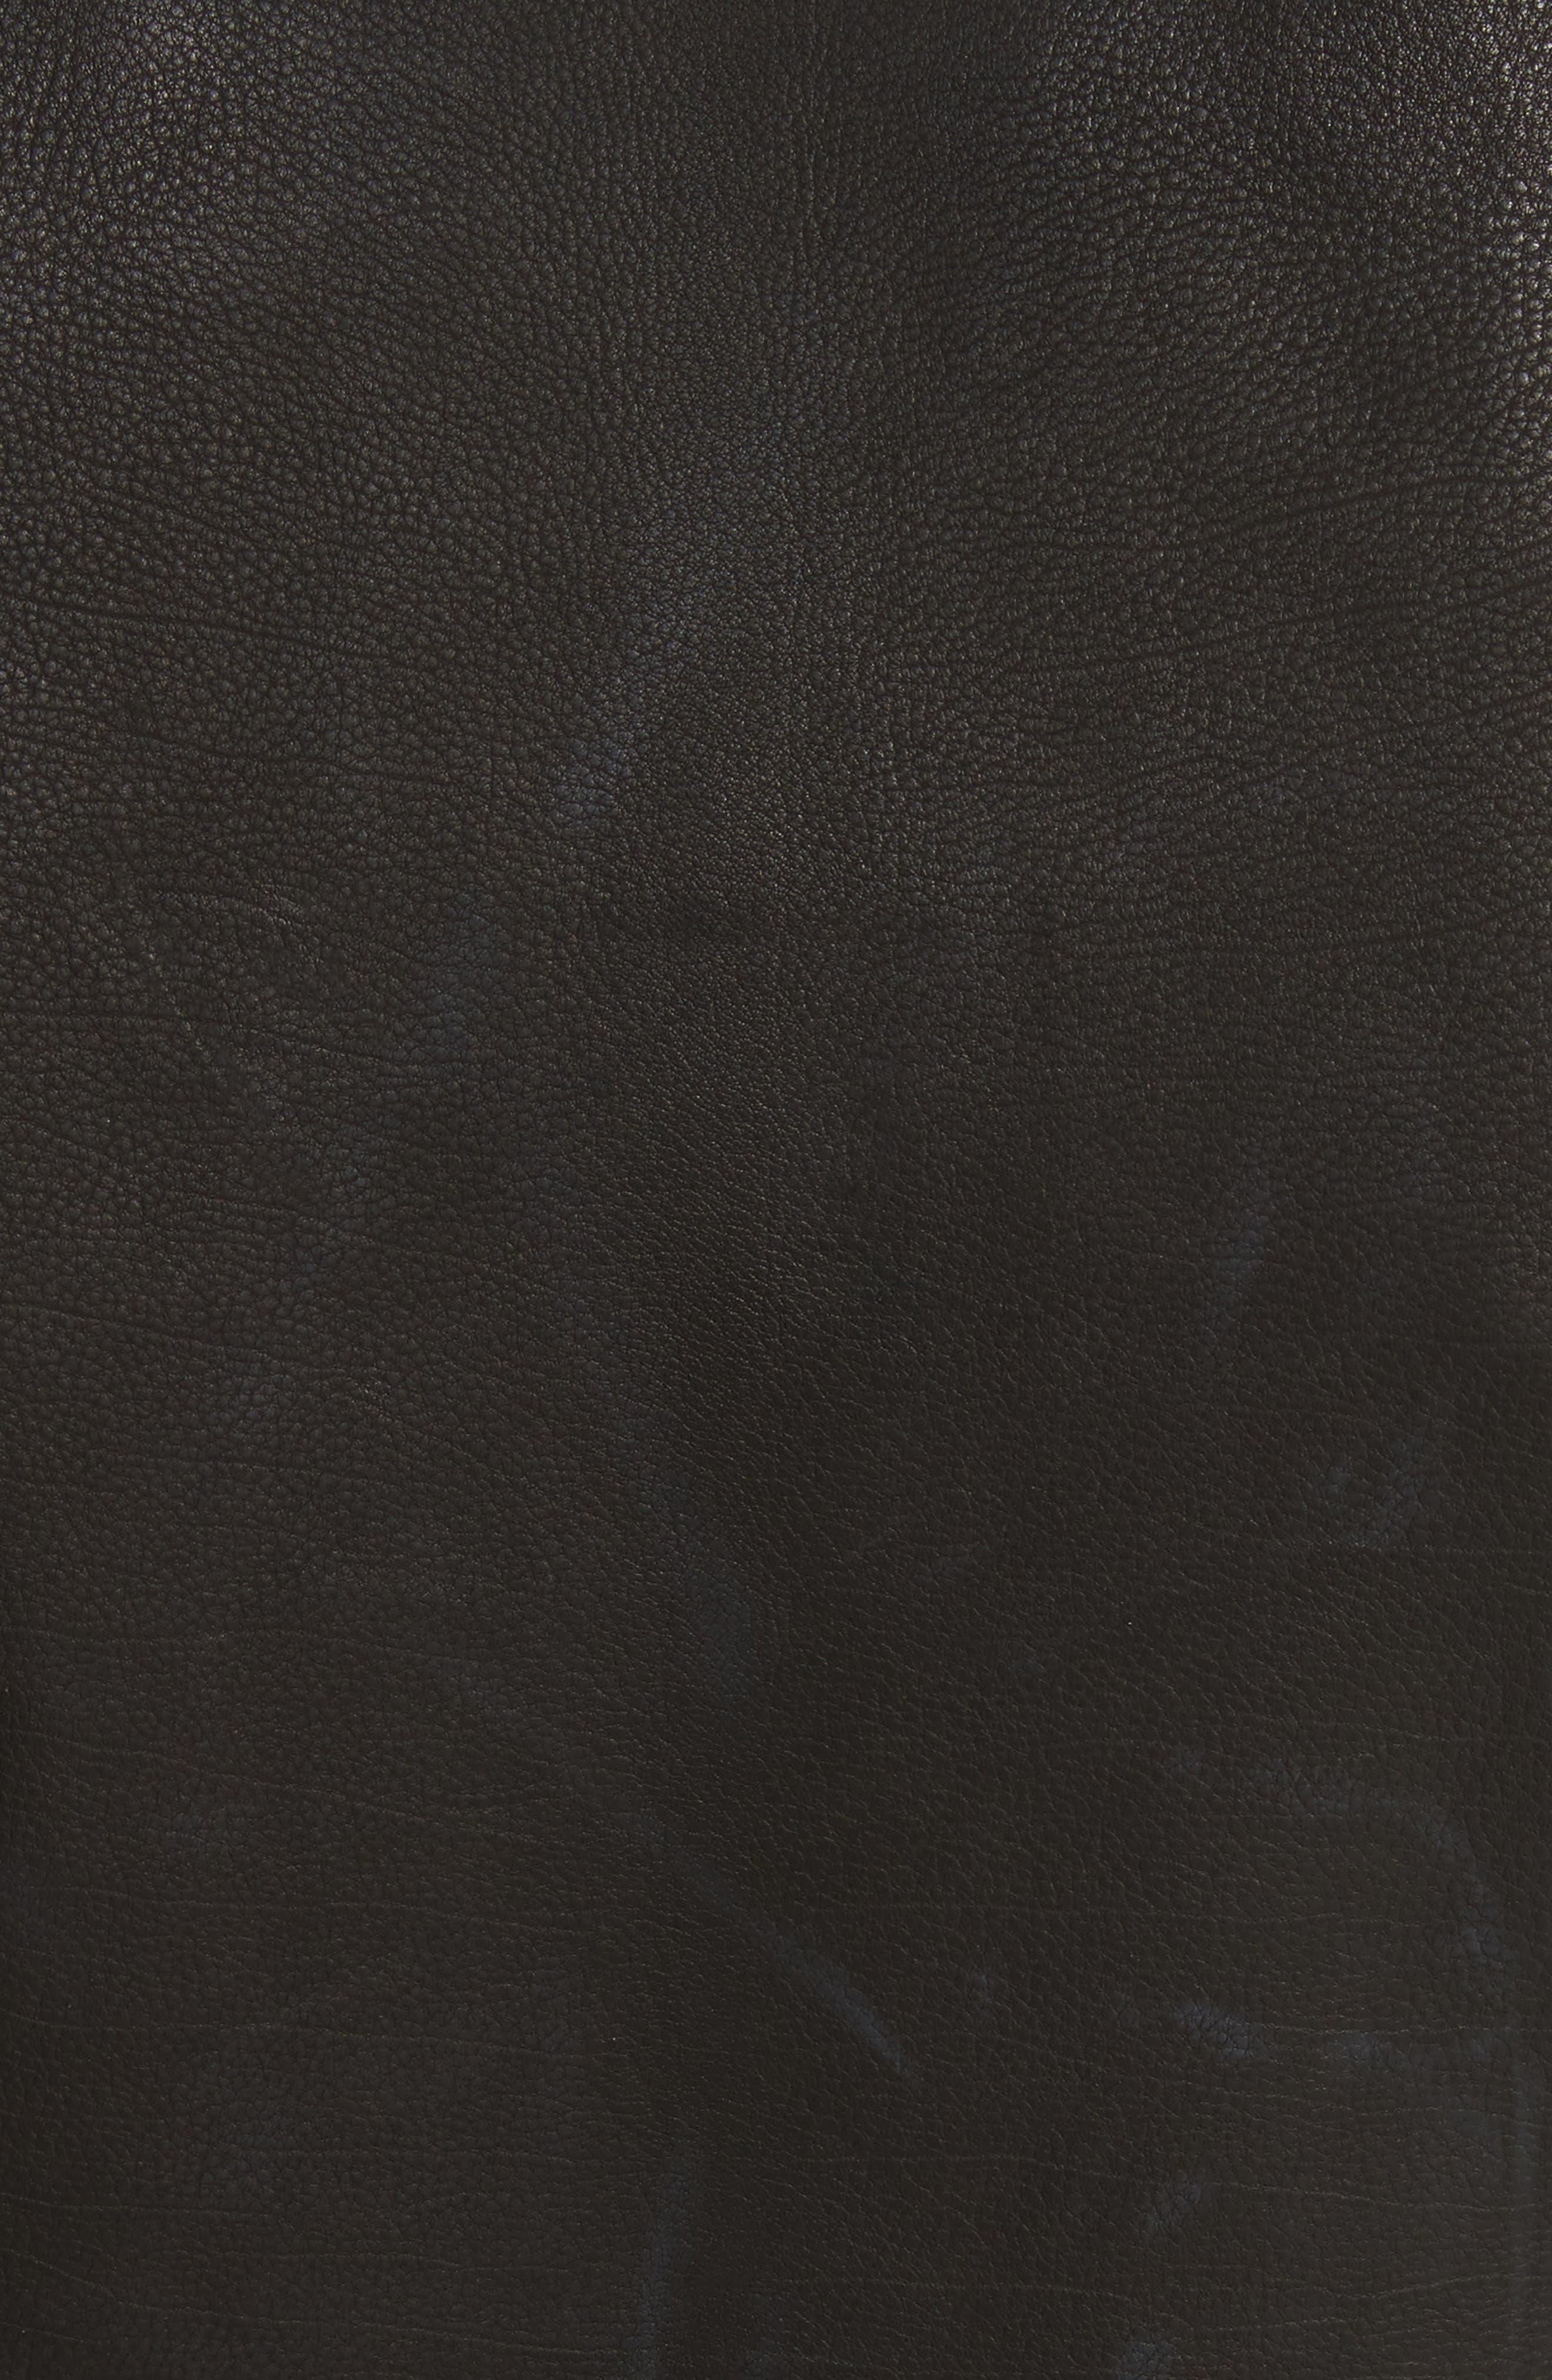 Calix Puff Shoulder Leather Moto Jacket,                             Alternate thumbnail 6, color,                             001